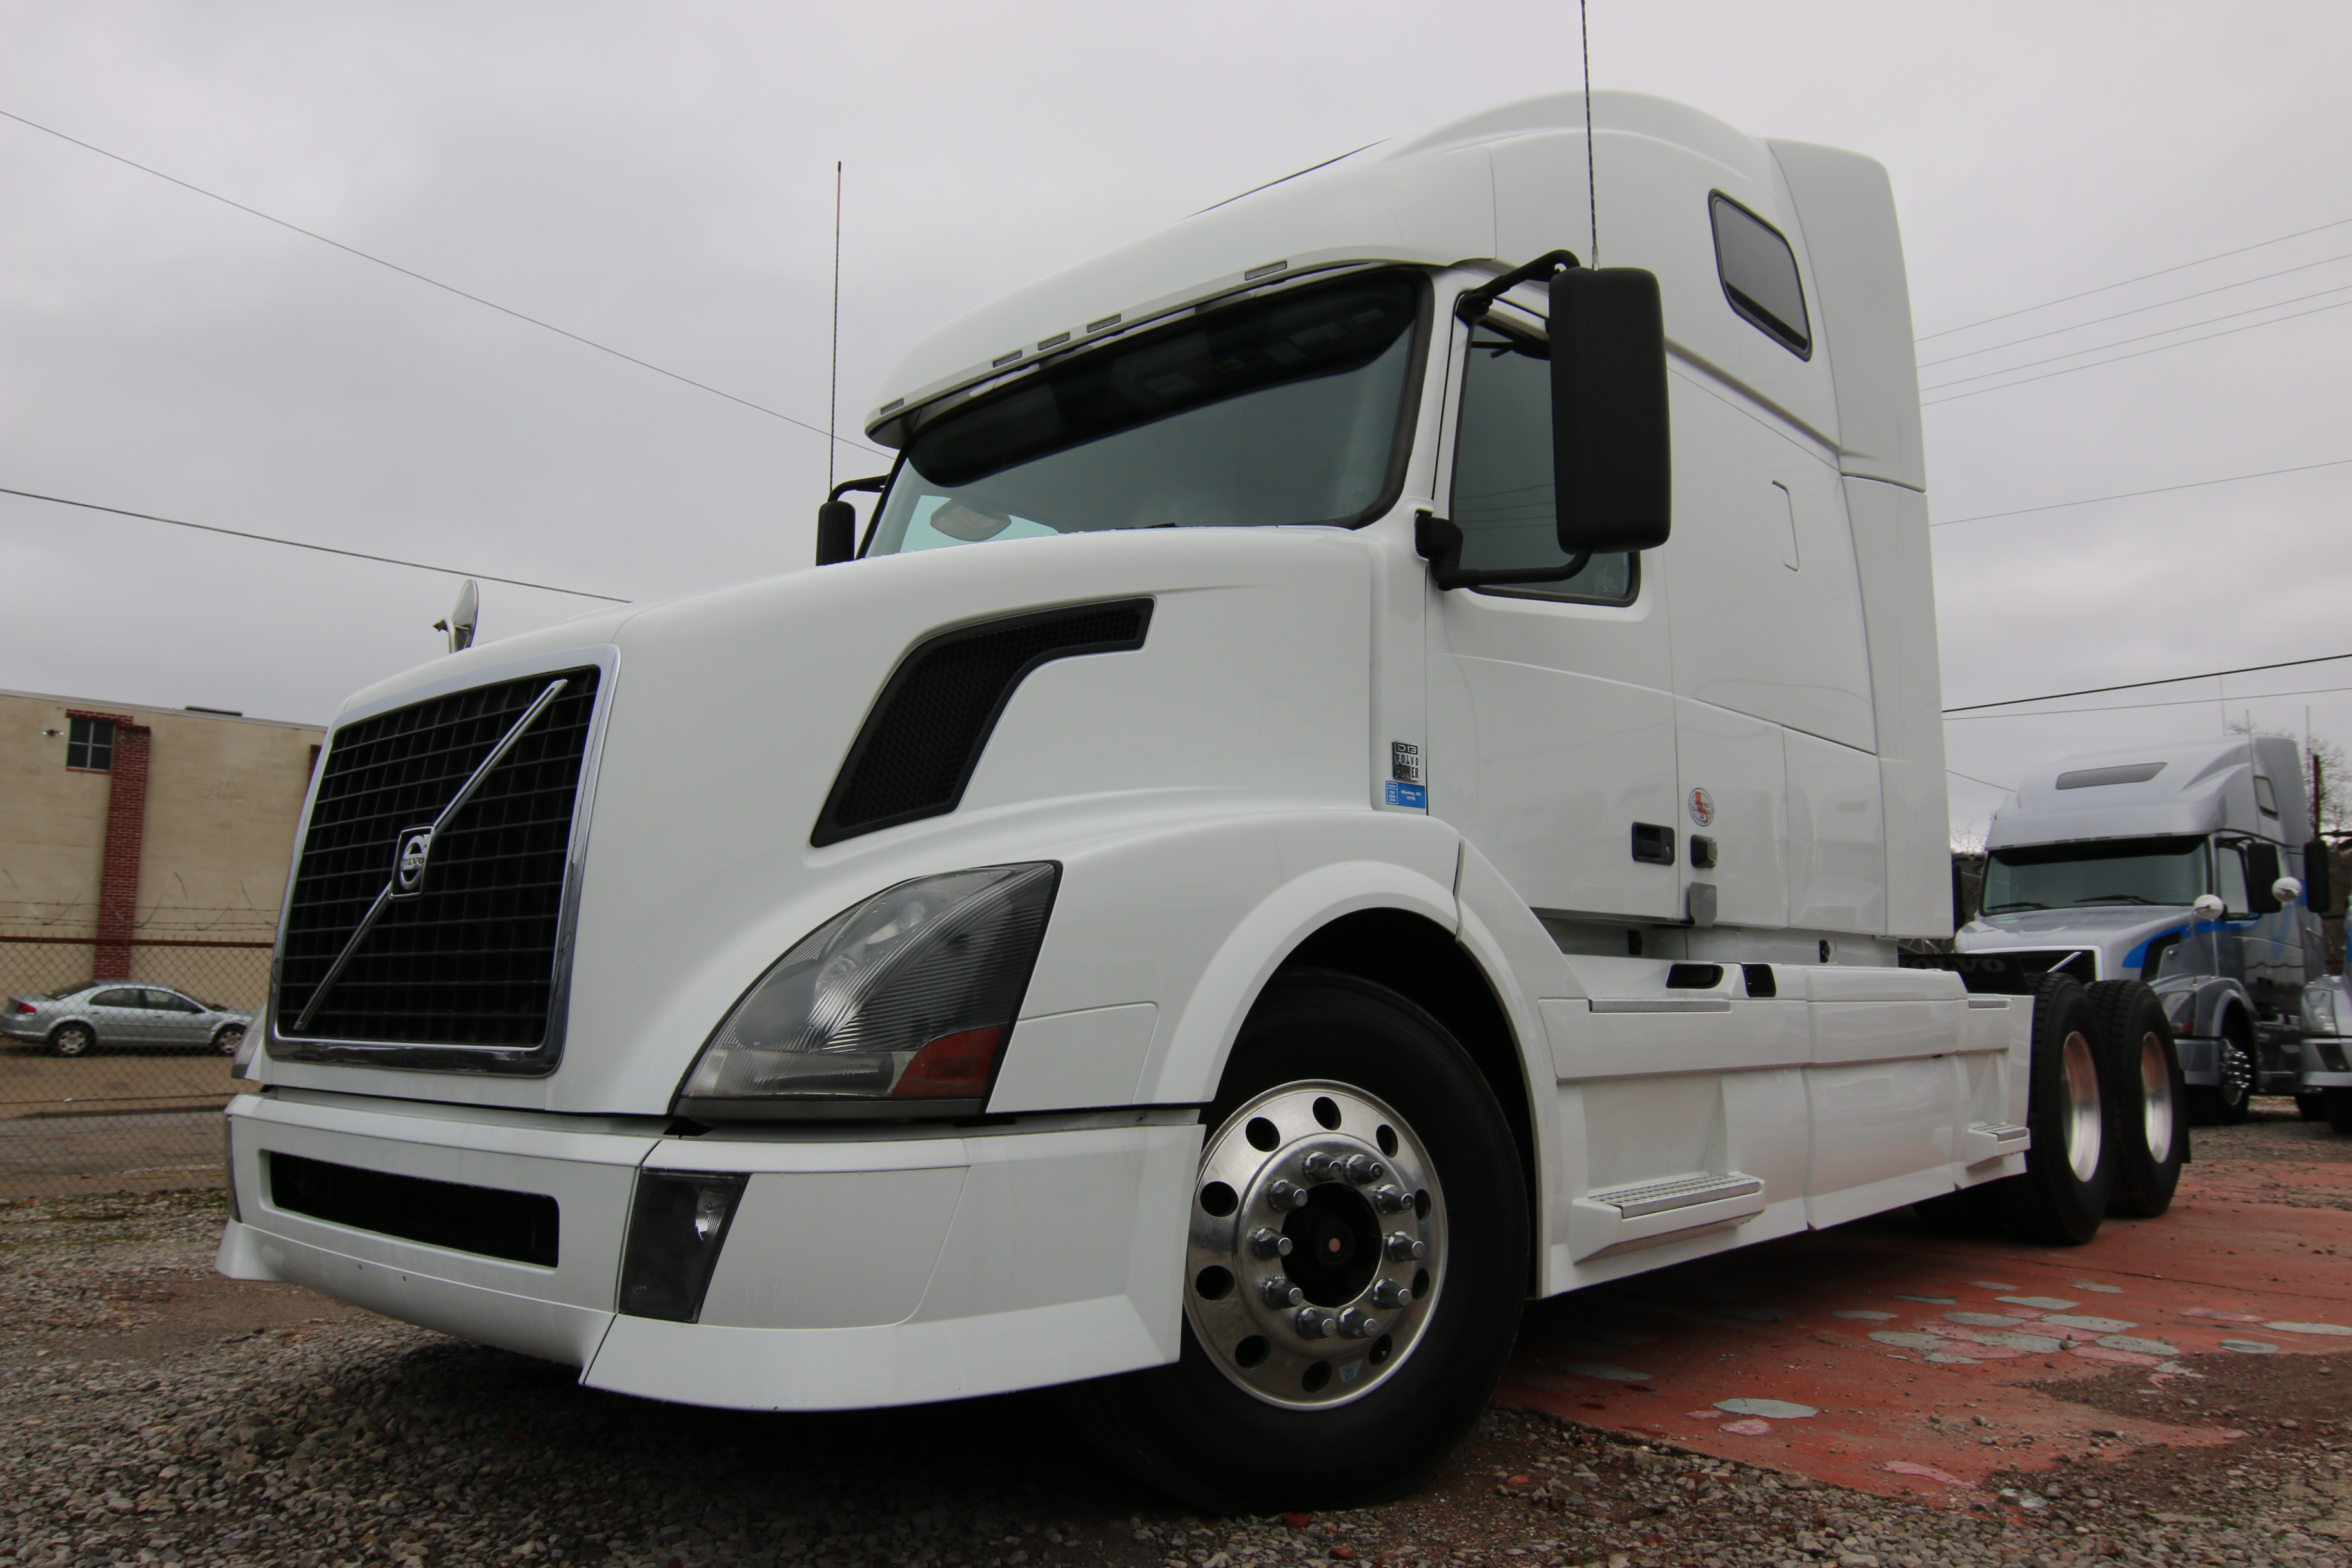 2018 Volvo VNL64T670 Volvo Sleeper - 995949 - Wheeling Truck Center - Wheeling Truck Center